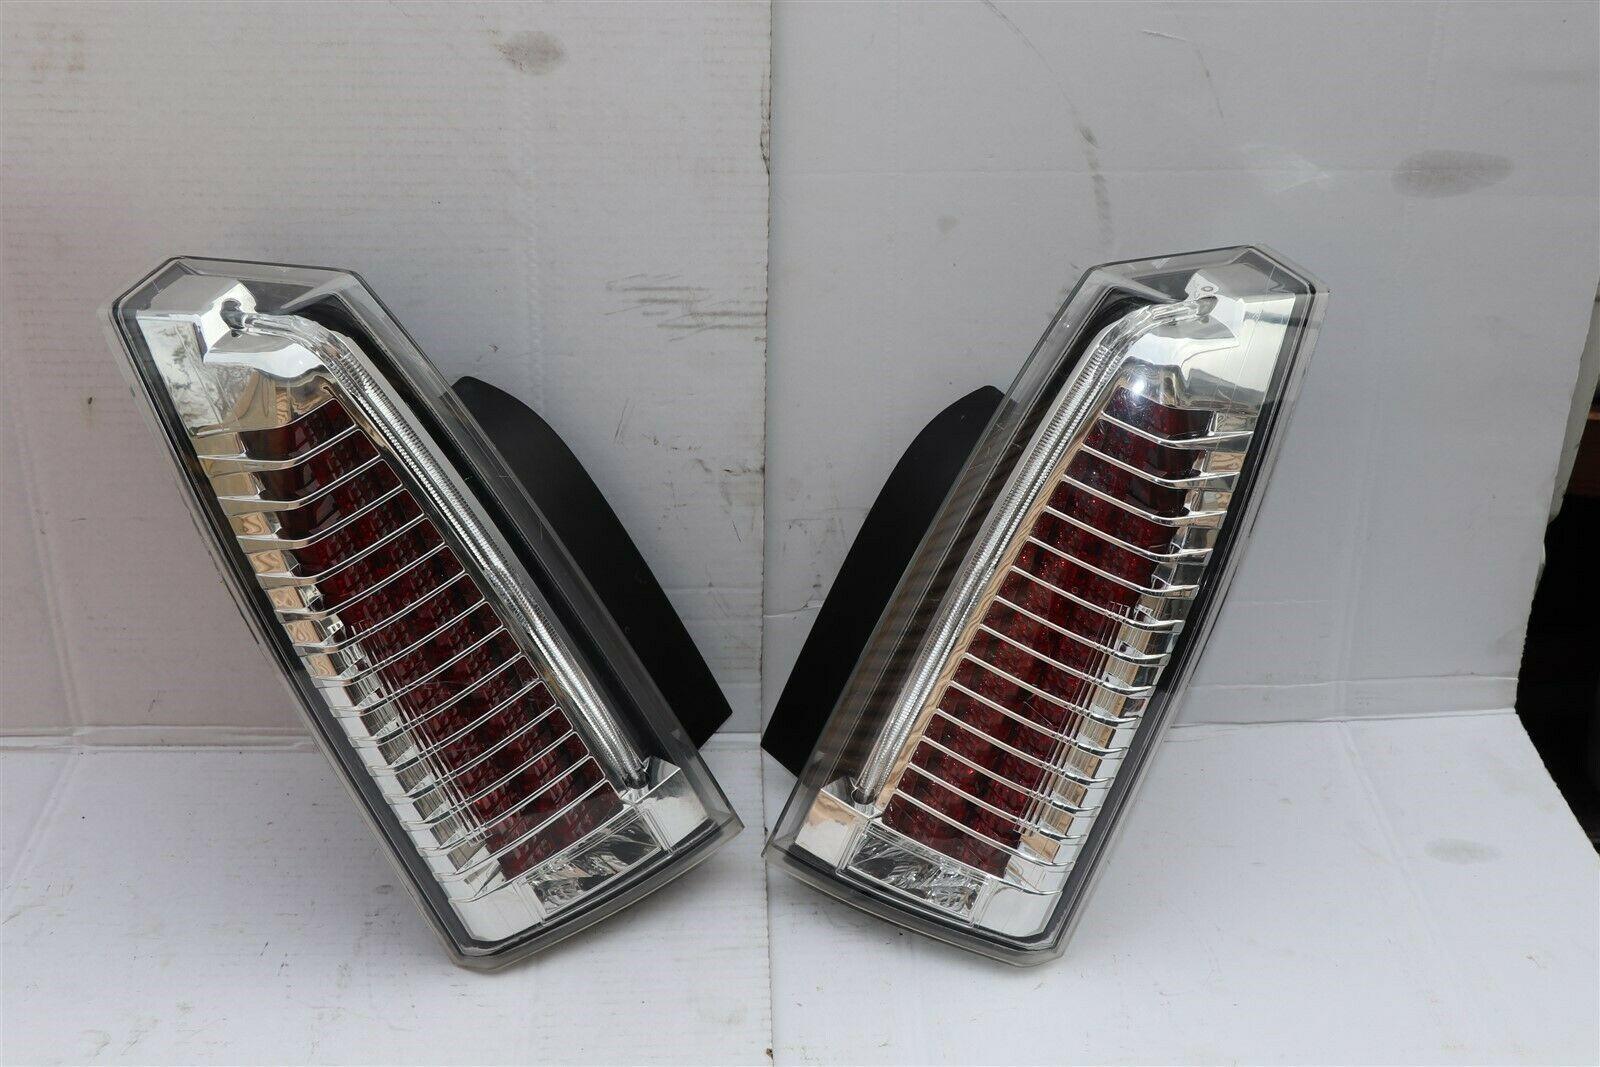 08-13 Cadillac CTS 4 door Sedan Euro LED Rear Tail Light Lamps Set L&R